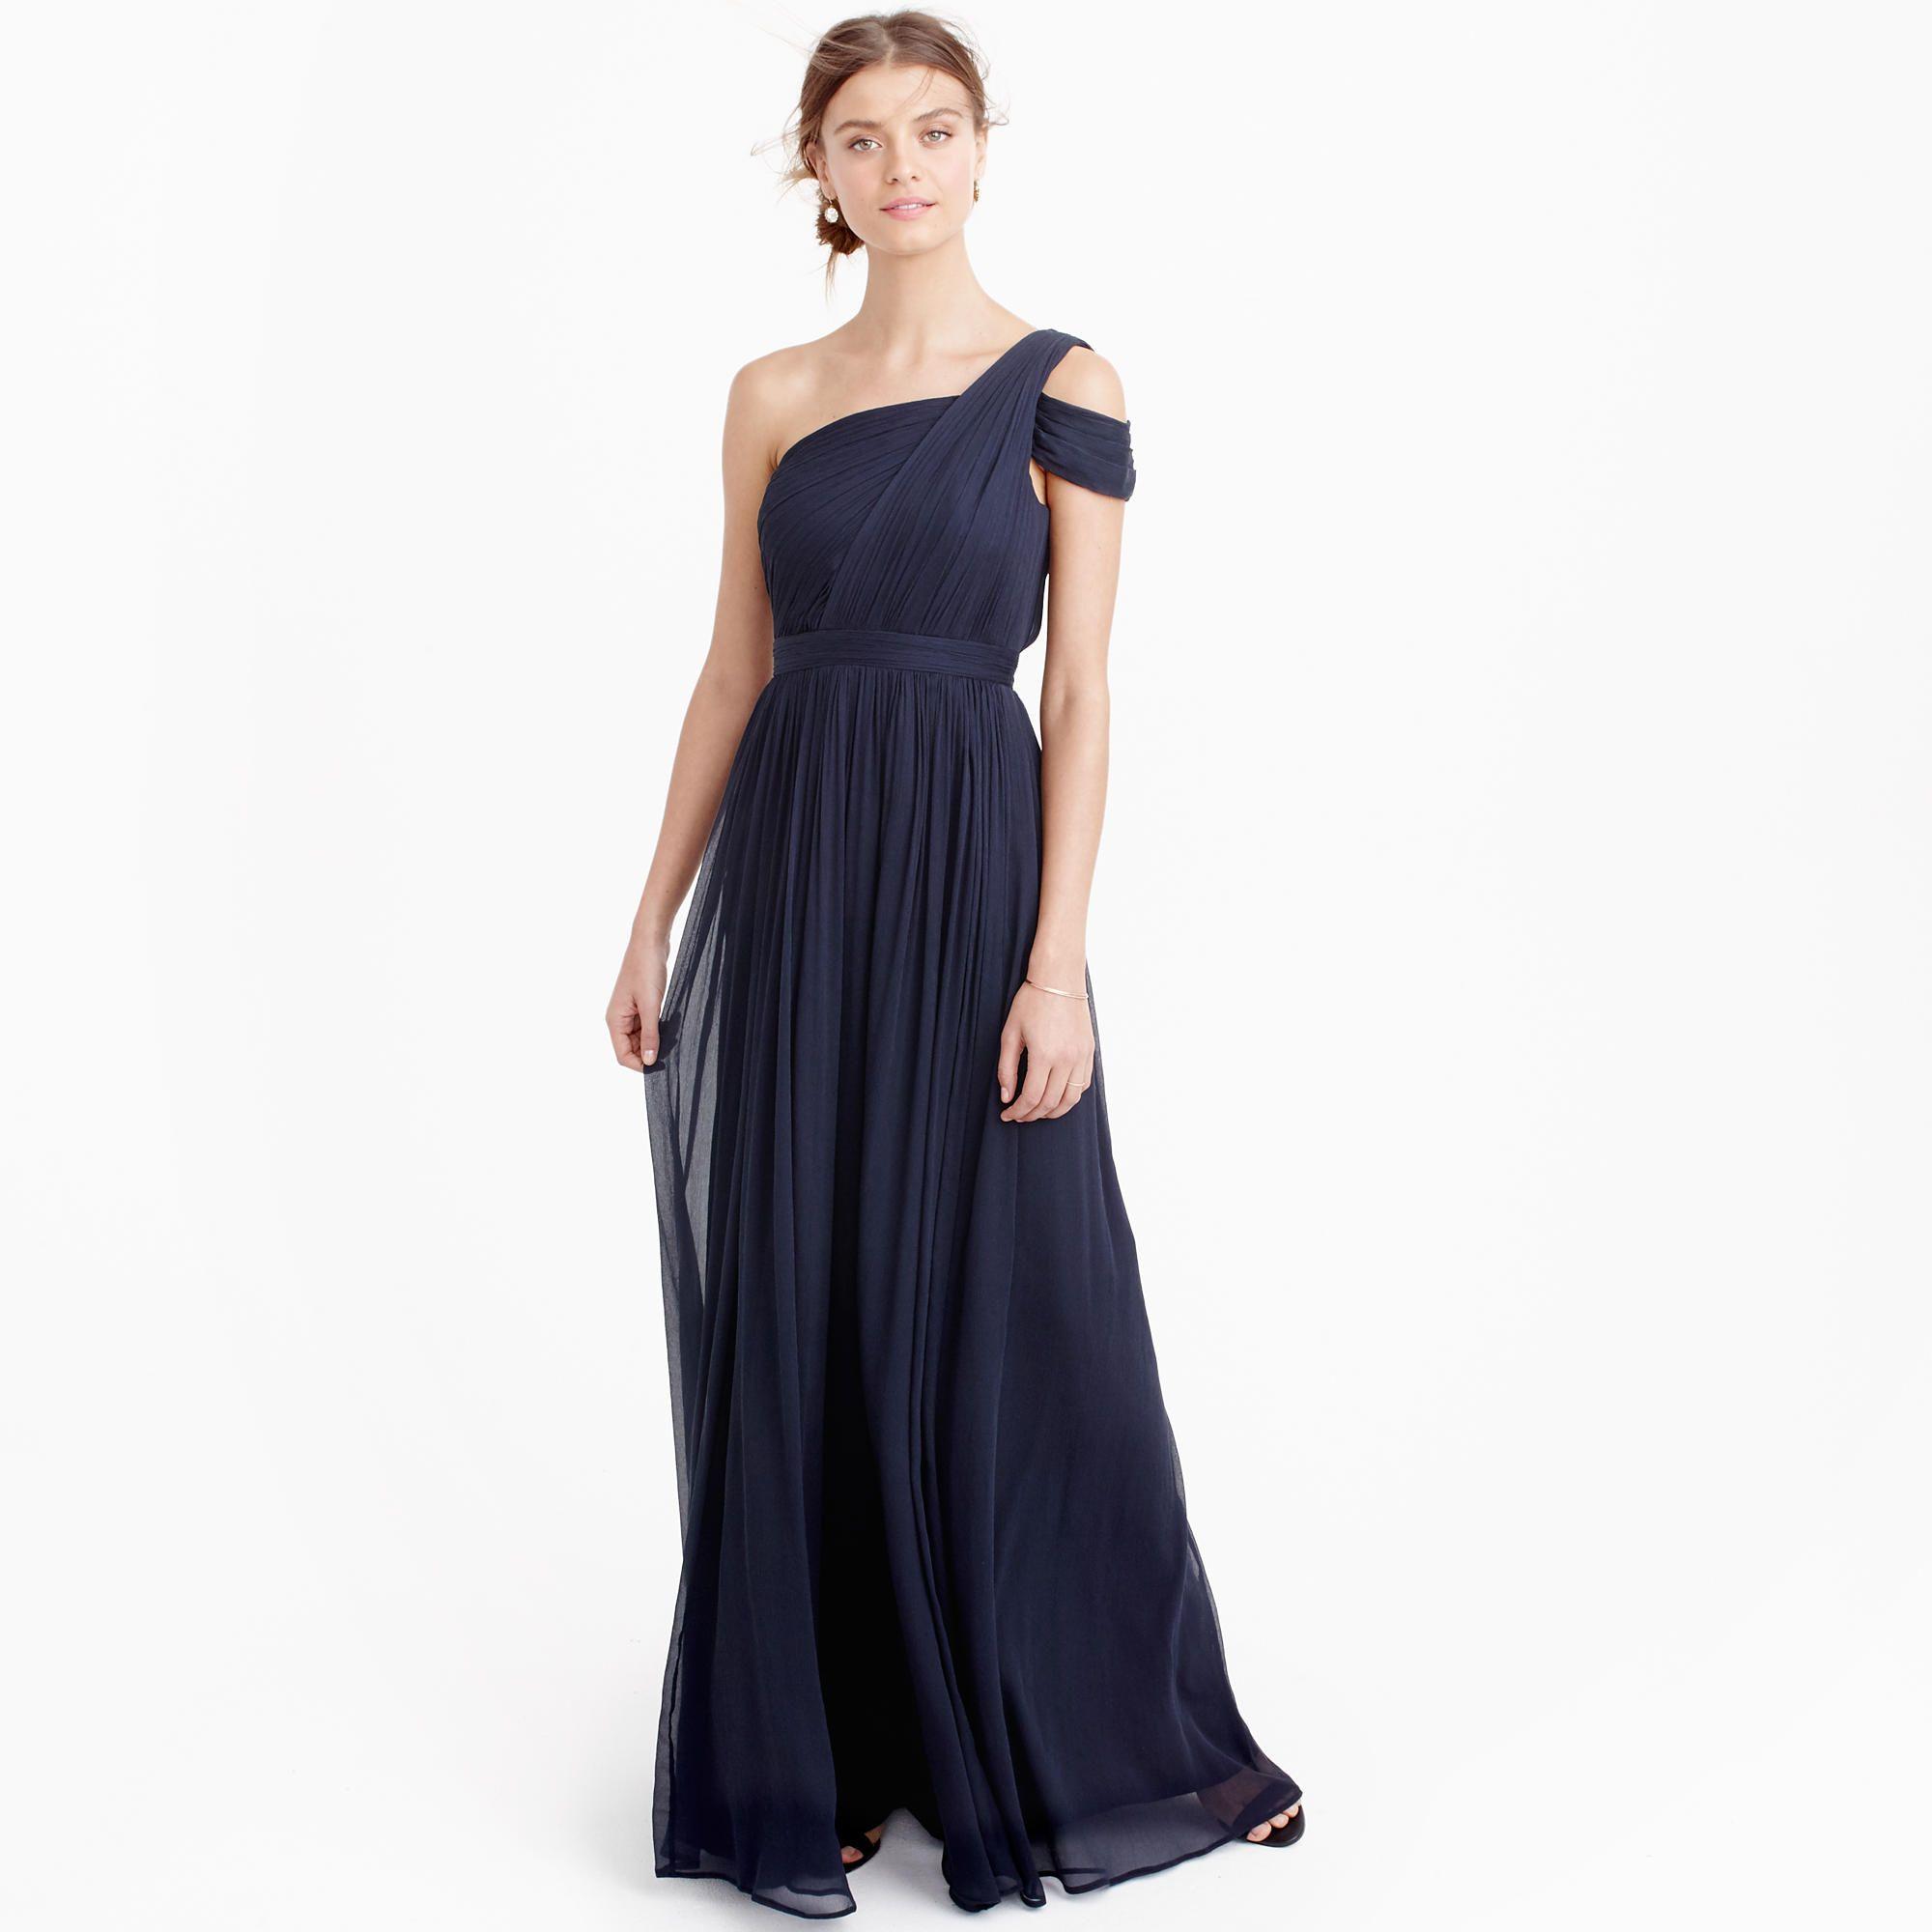 Cara long dress in silk chiffon silk chiffon jew moh perfect for a ball or a weddingcrew cara long dress in silk chiffon ombrellifo Choice Image